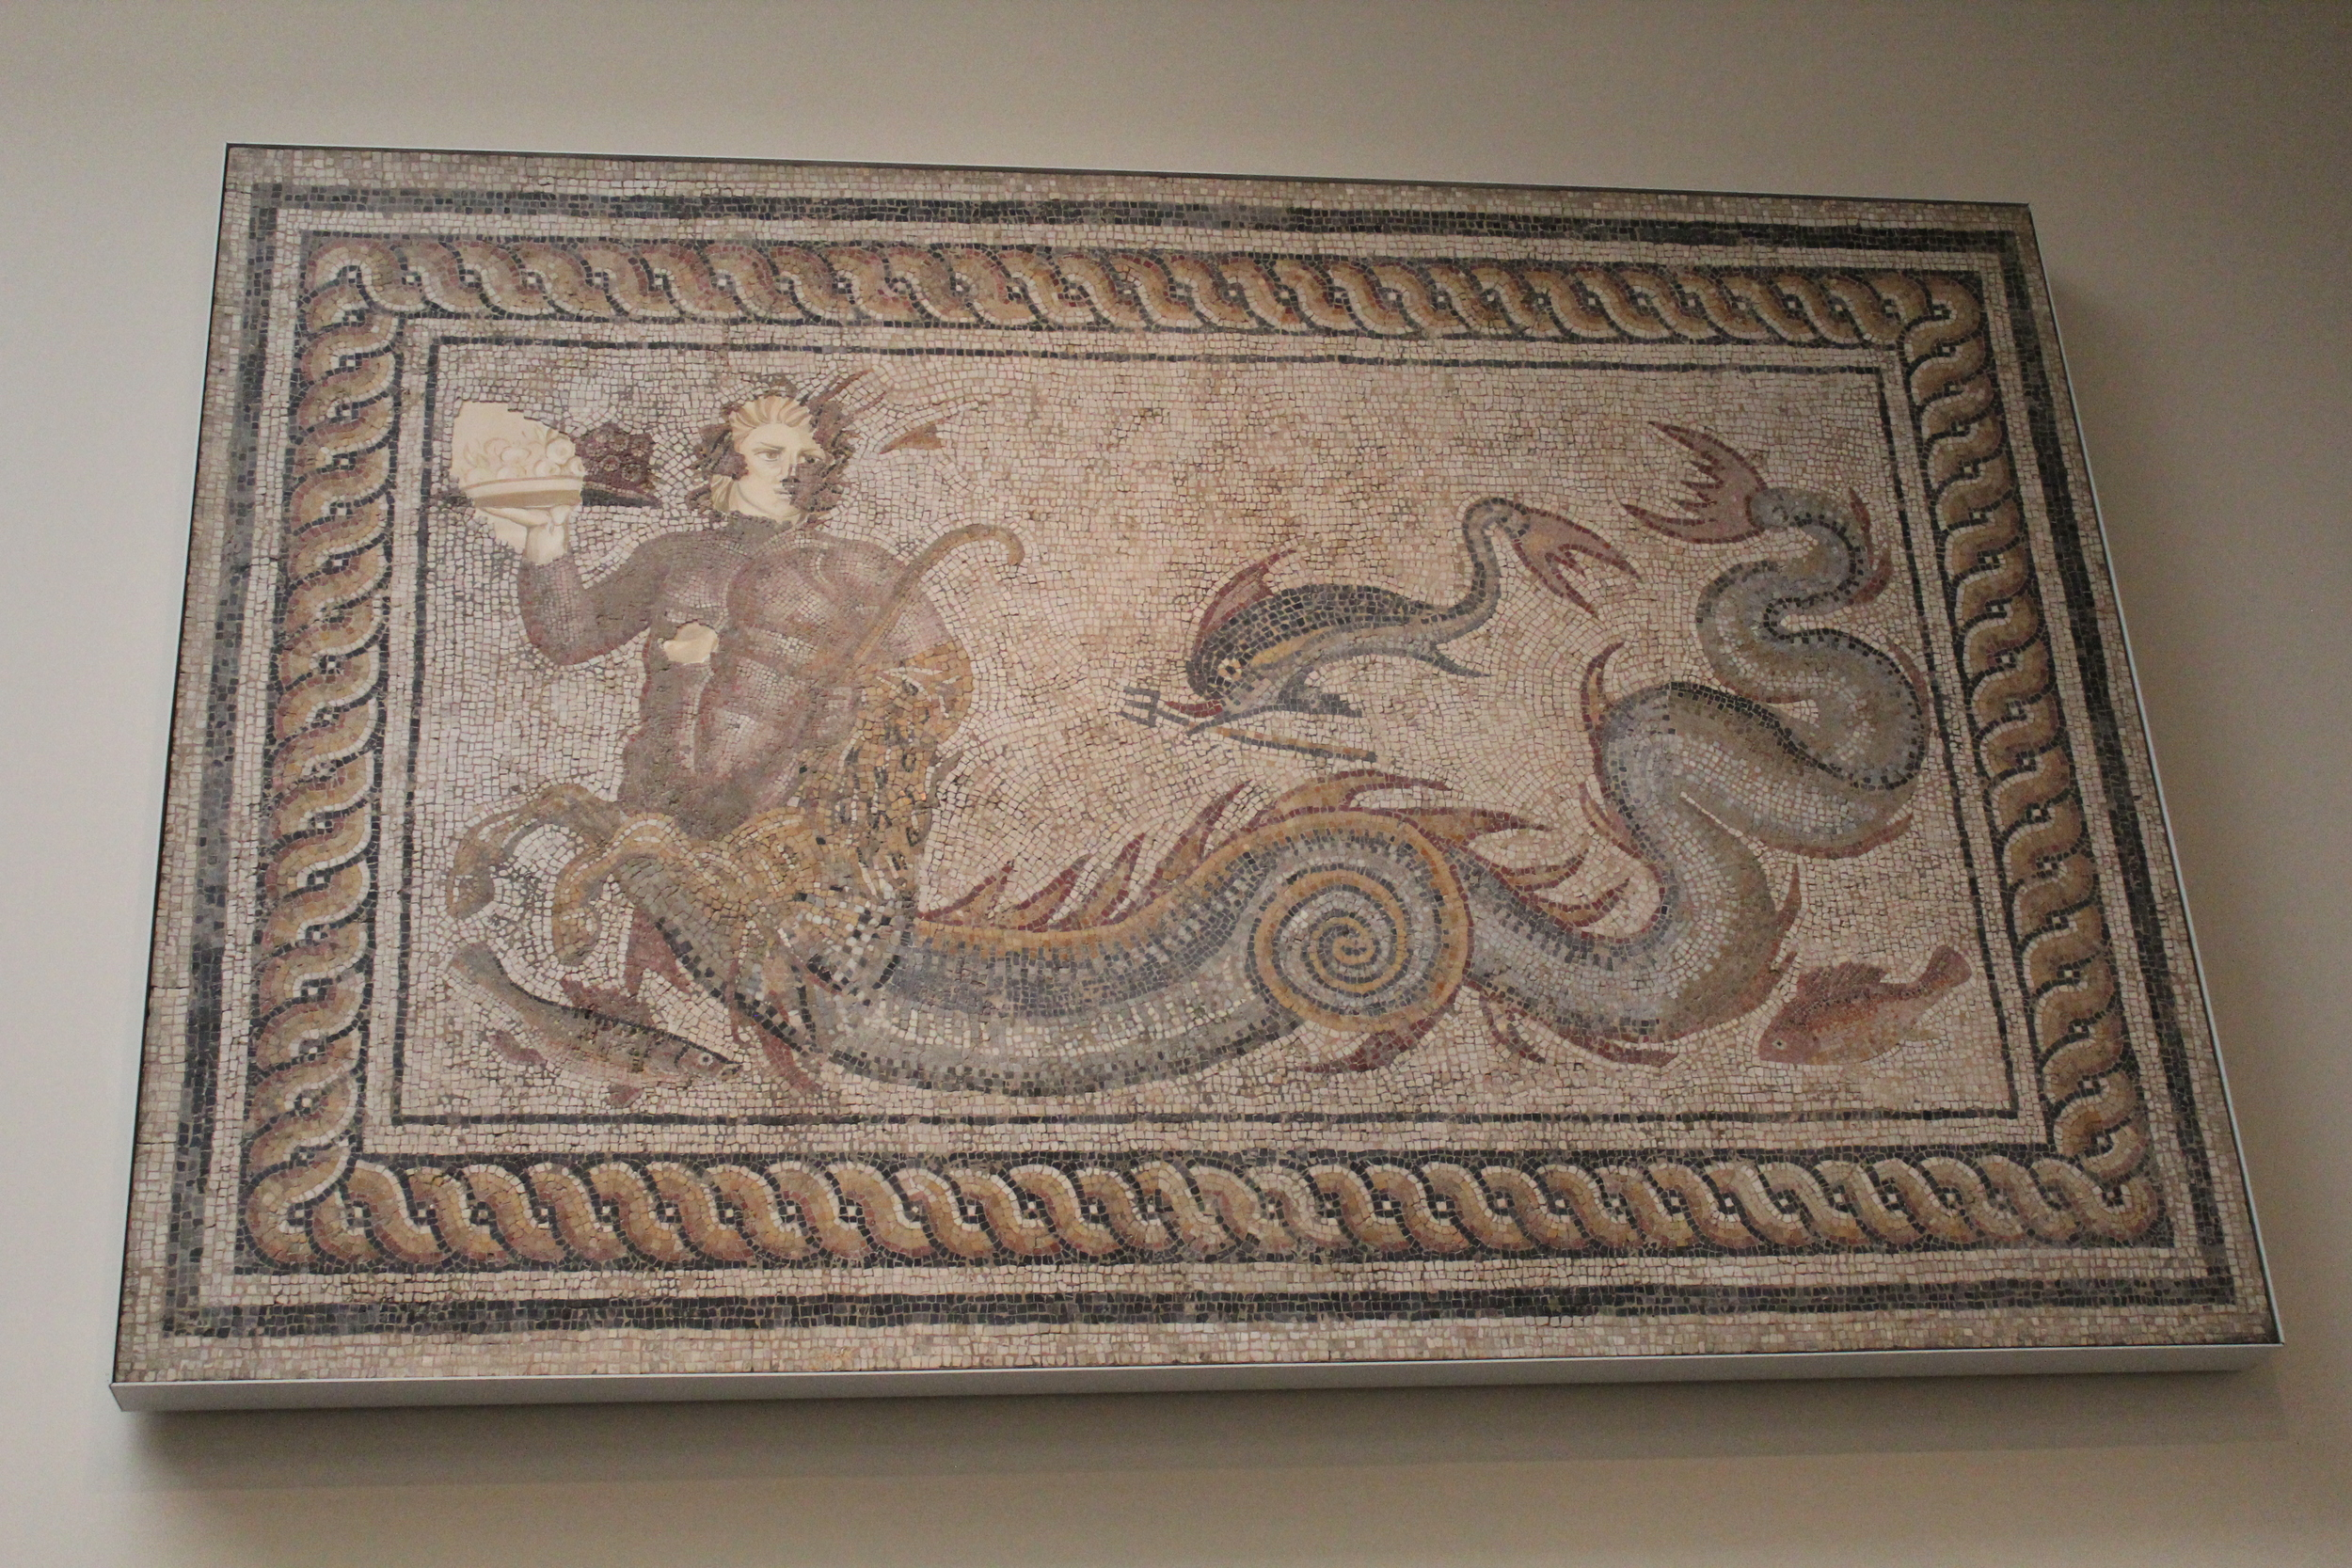 British Museum Tile Mosaic